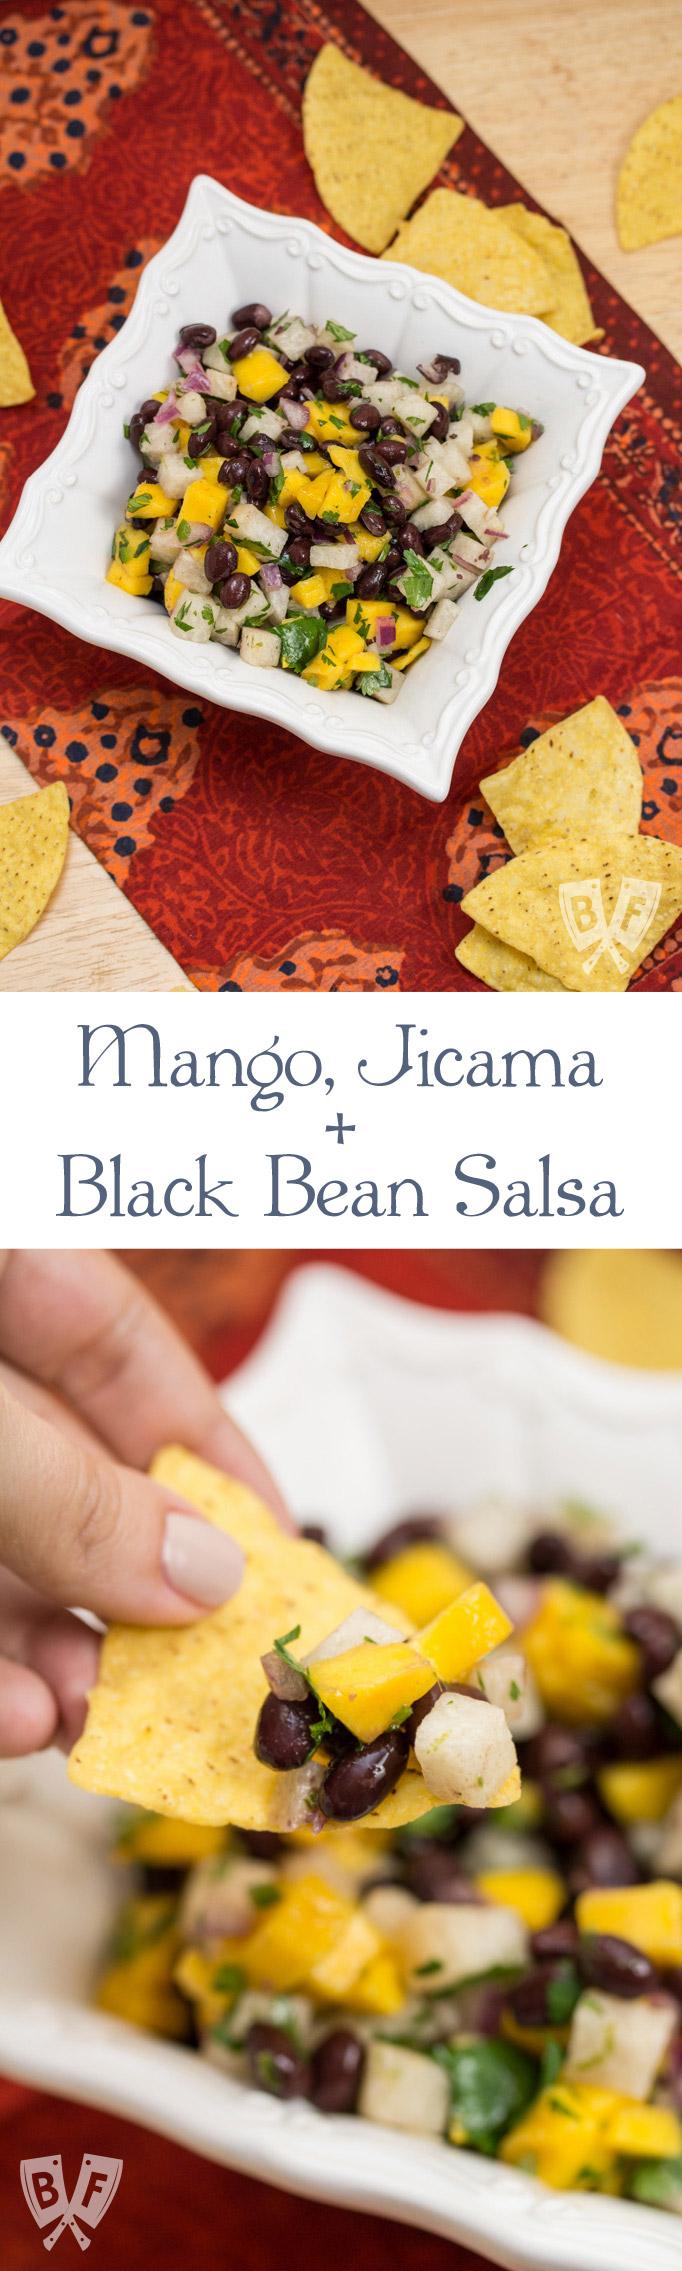 Mango, Jicama + Black Bean Salsa